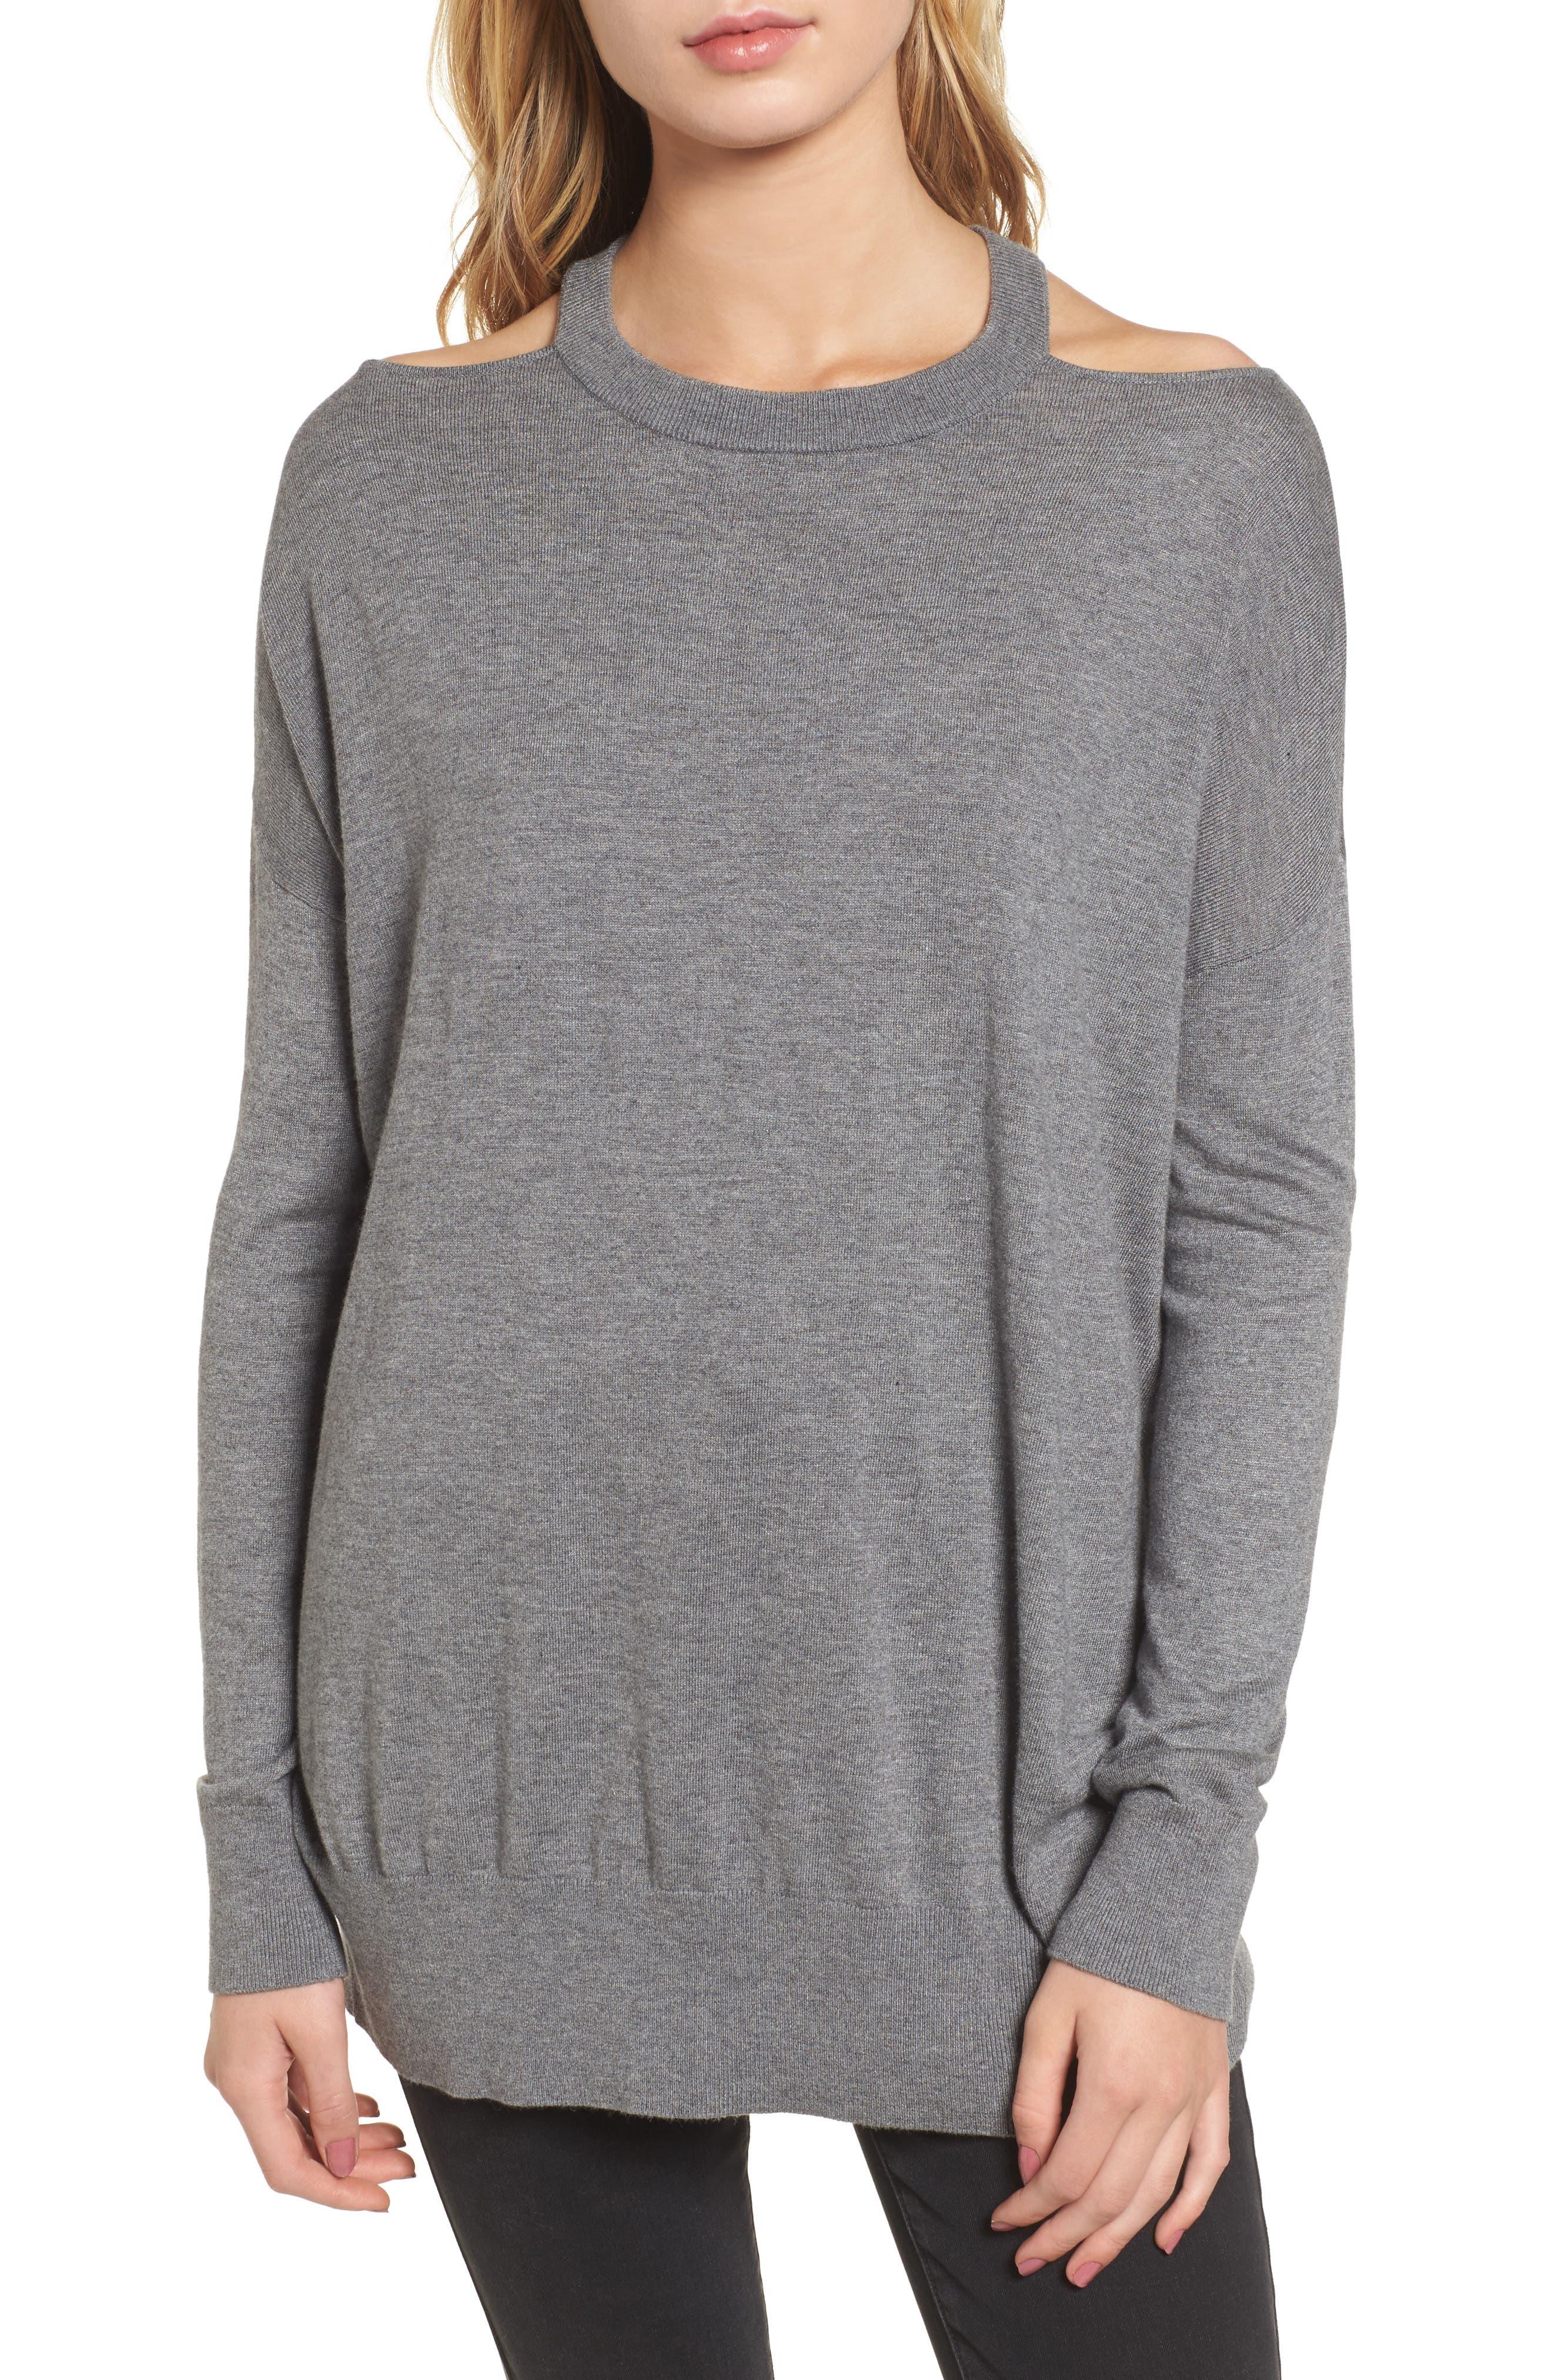 Canarise Cutout Sweater,                             Main thumbnail 1, color,                             Heather Cinder